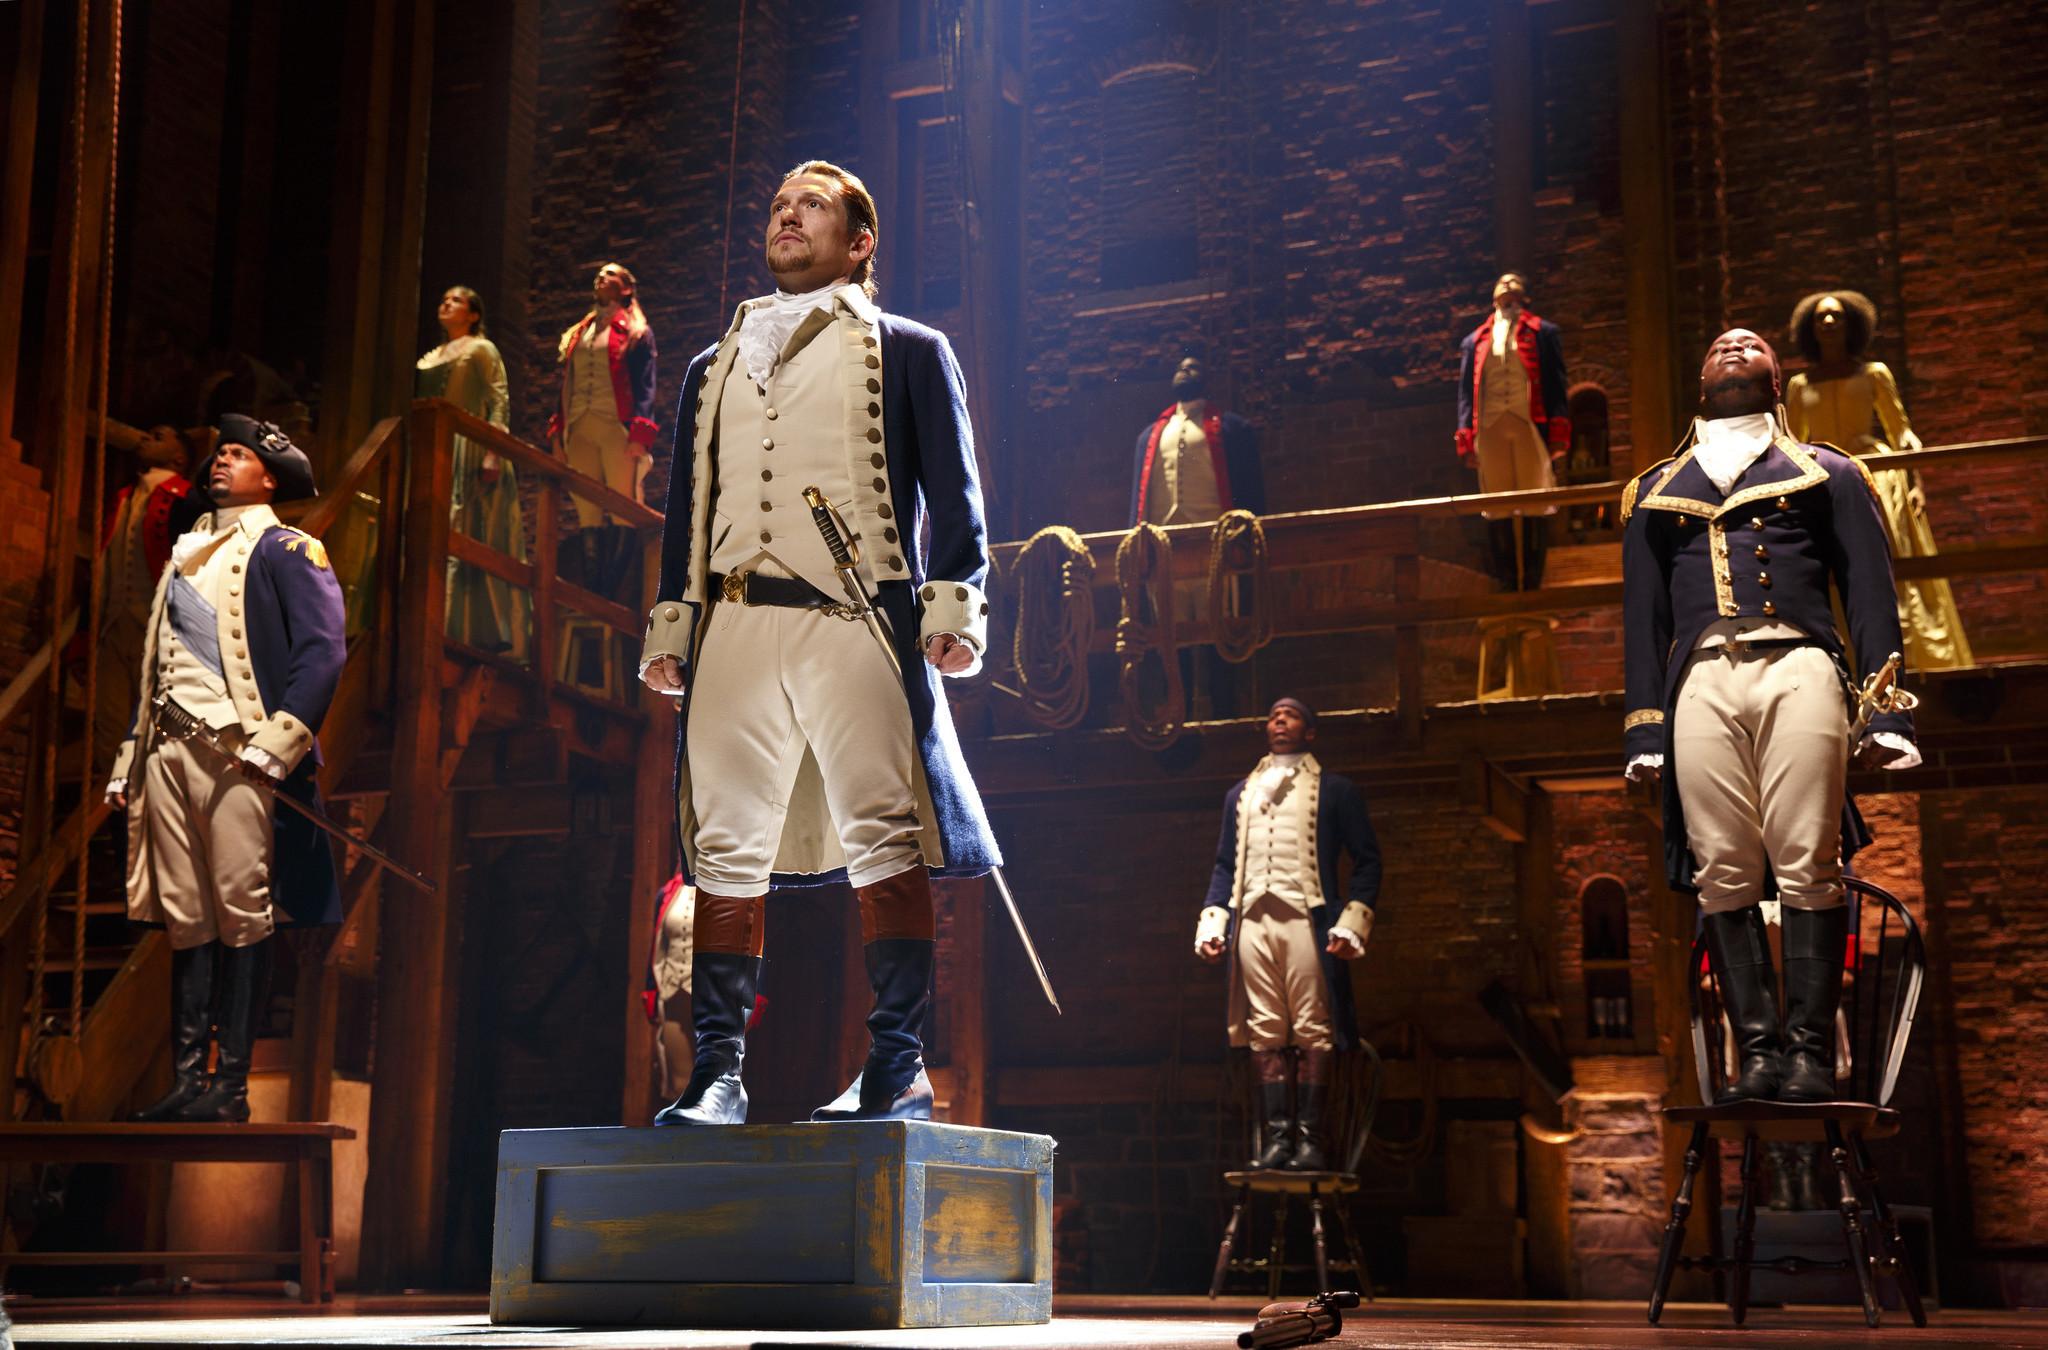 Meet the people who didn't like 'Hamilton' - Chicago Tribune